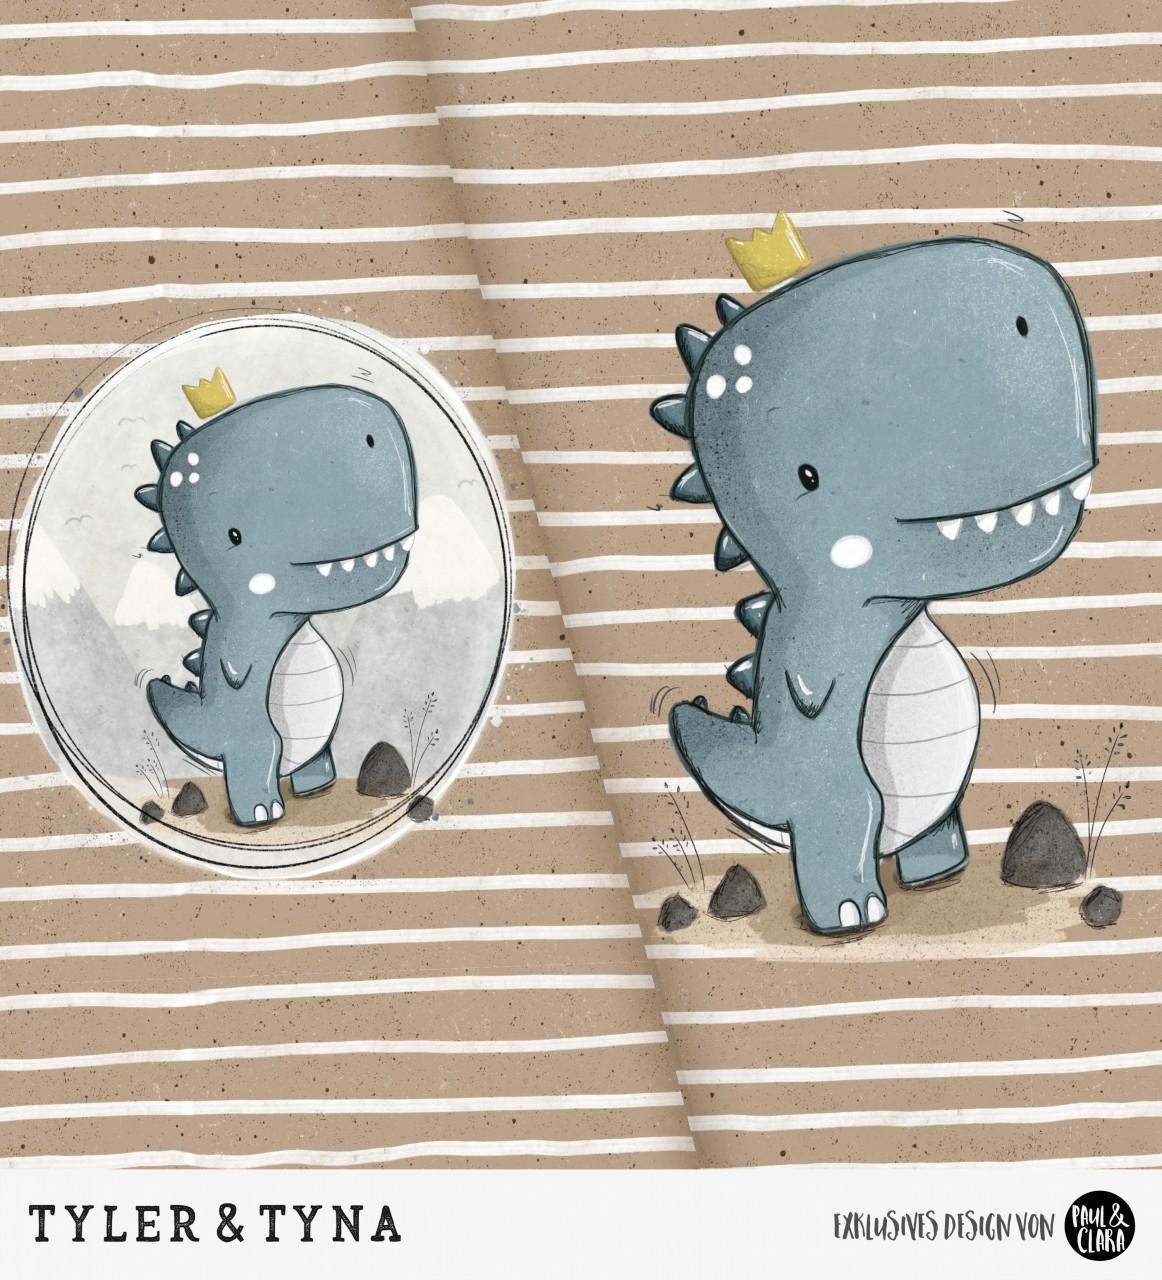 Tyler & Tyna - Panel Braun *Bio-Sommersweat*